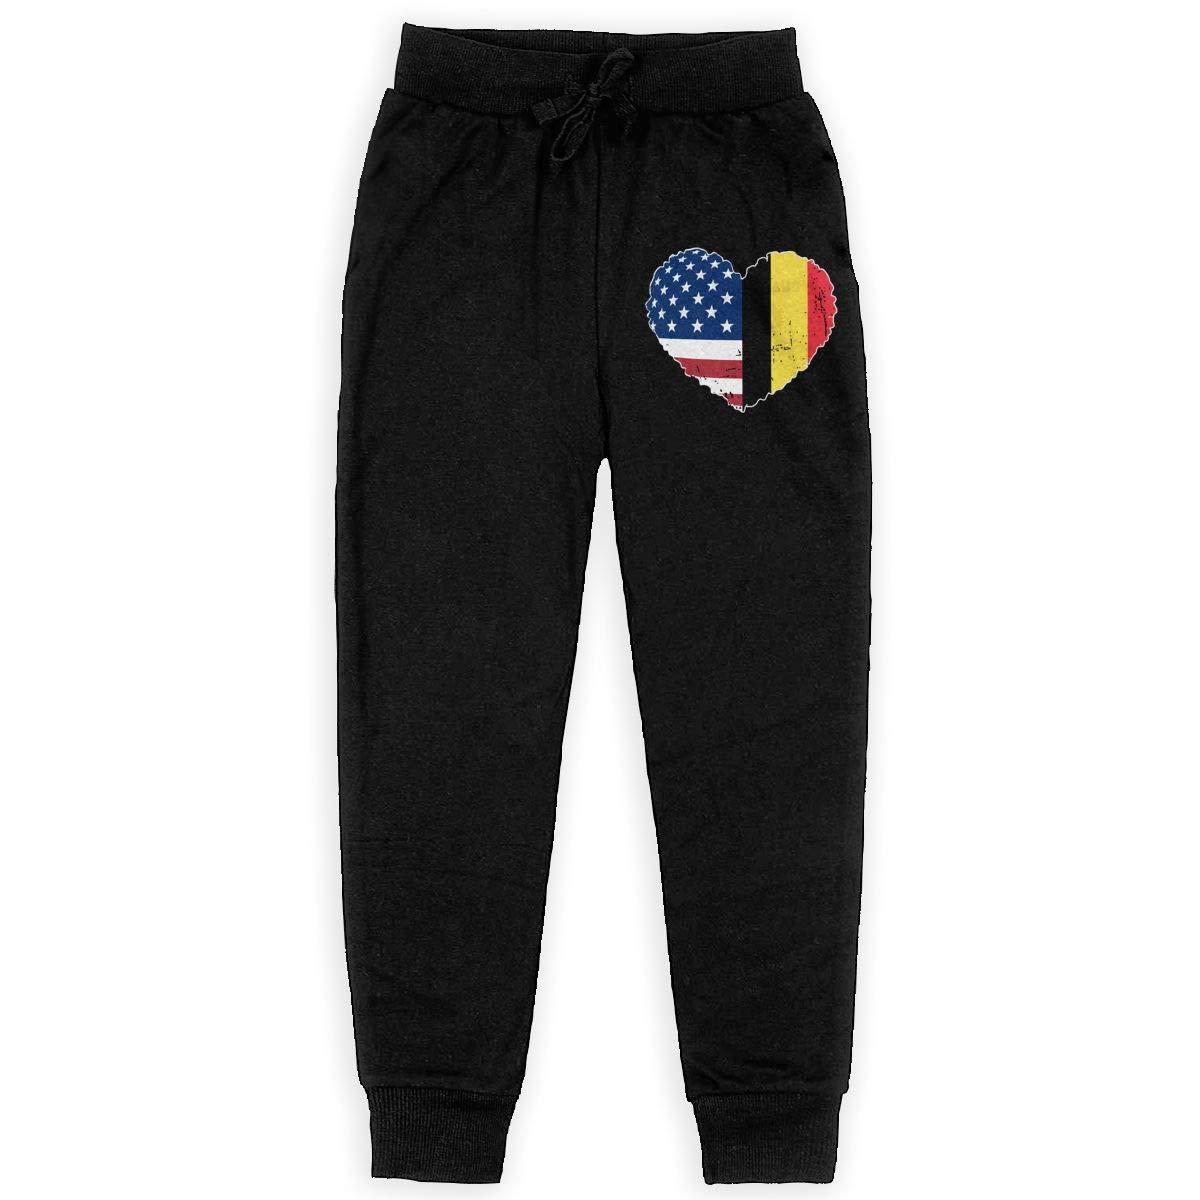 WYZVK22 Belgium USA Flag Heart Soft//Cozy Sweatpants Youth Warm Fleece Active Pants for Teen Boy